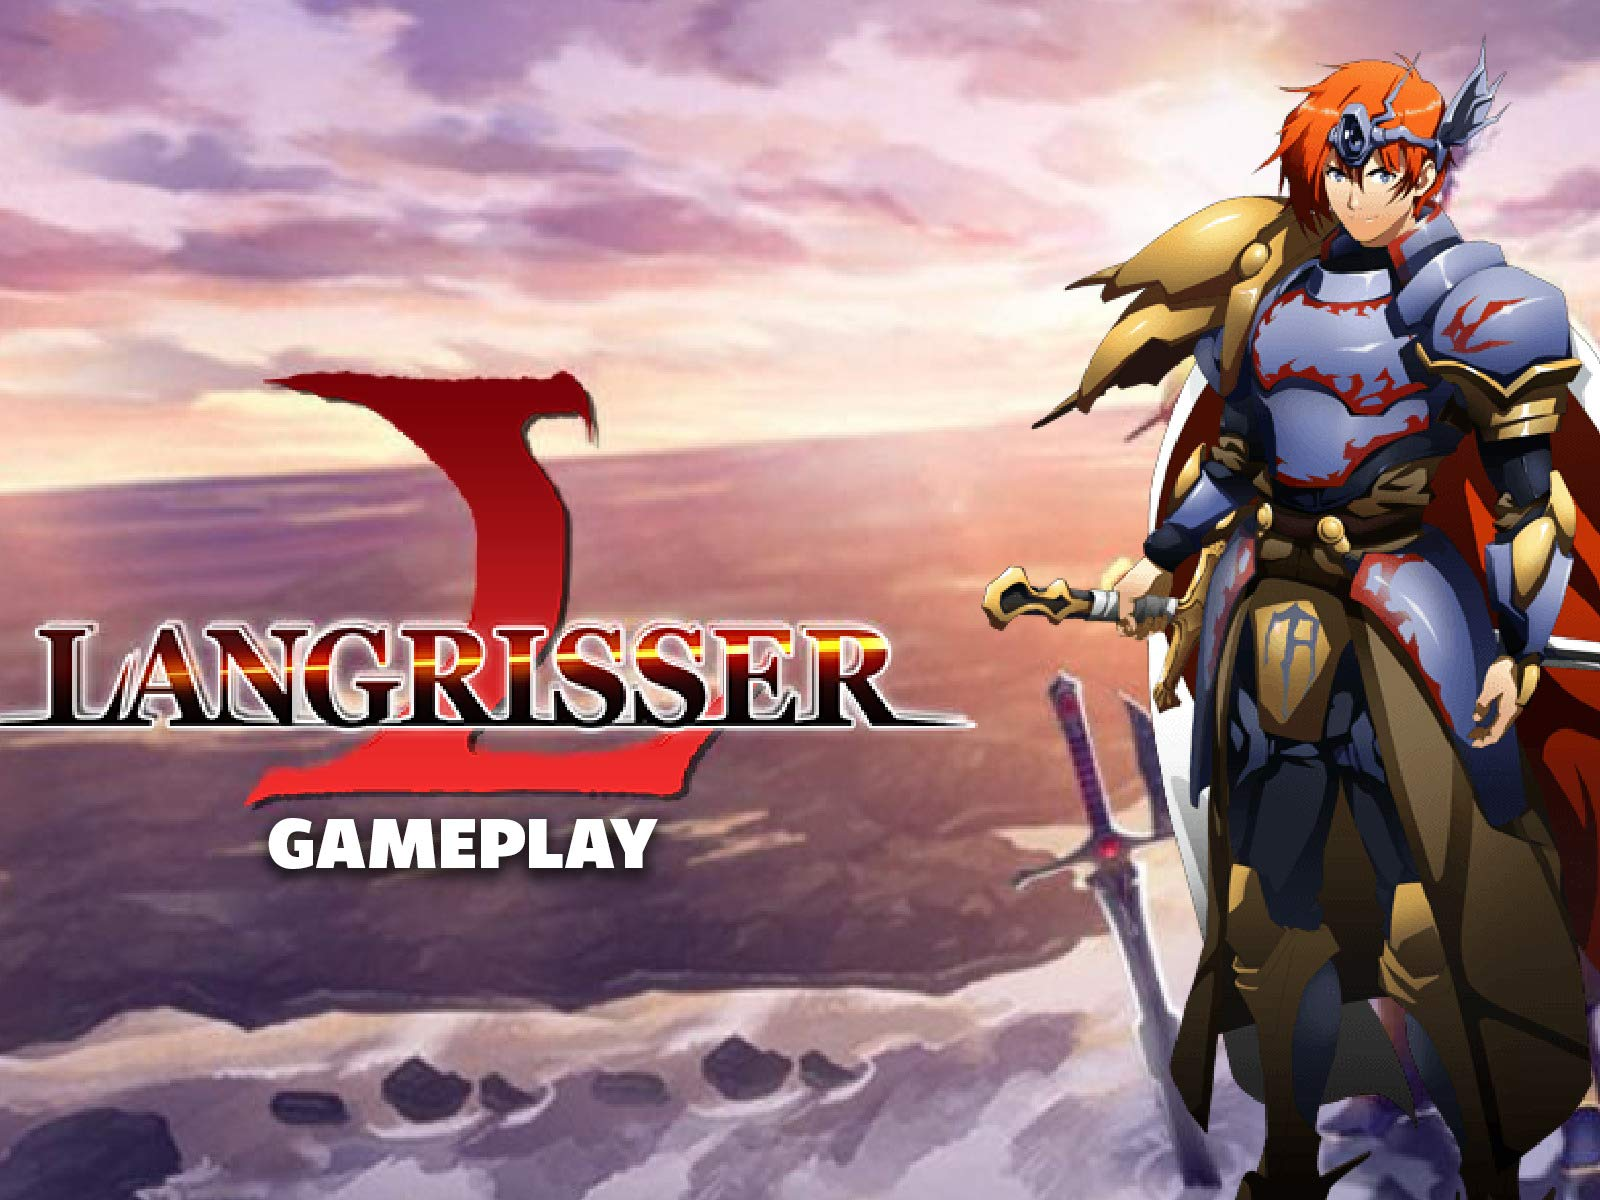 Langrisser Gameplay on Amazon Prime Instant Video UK